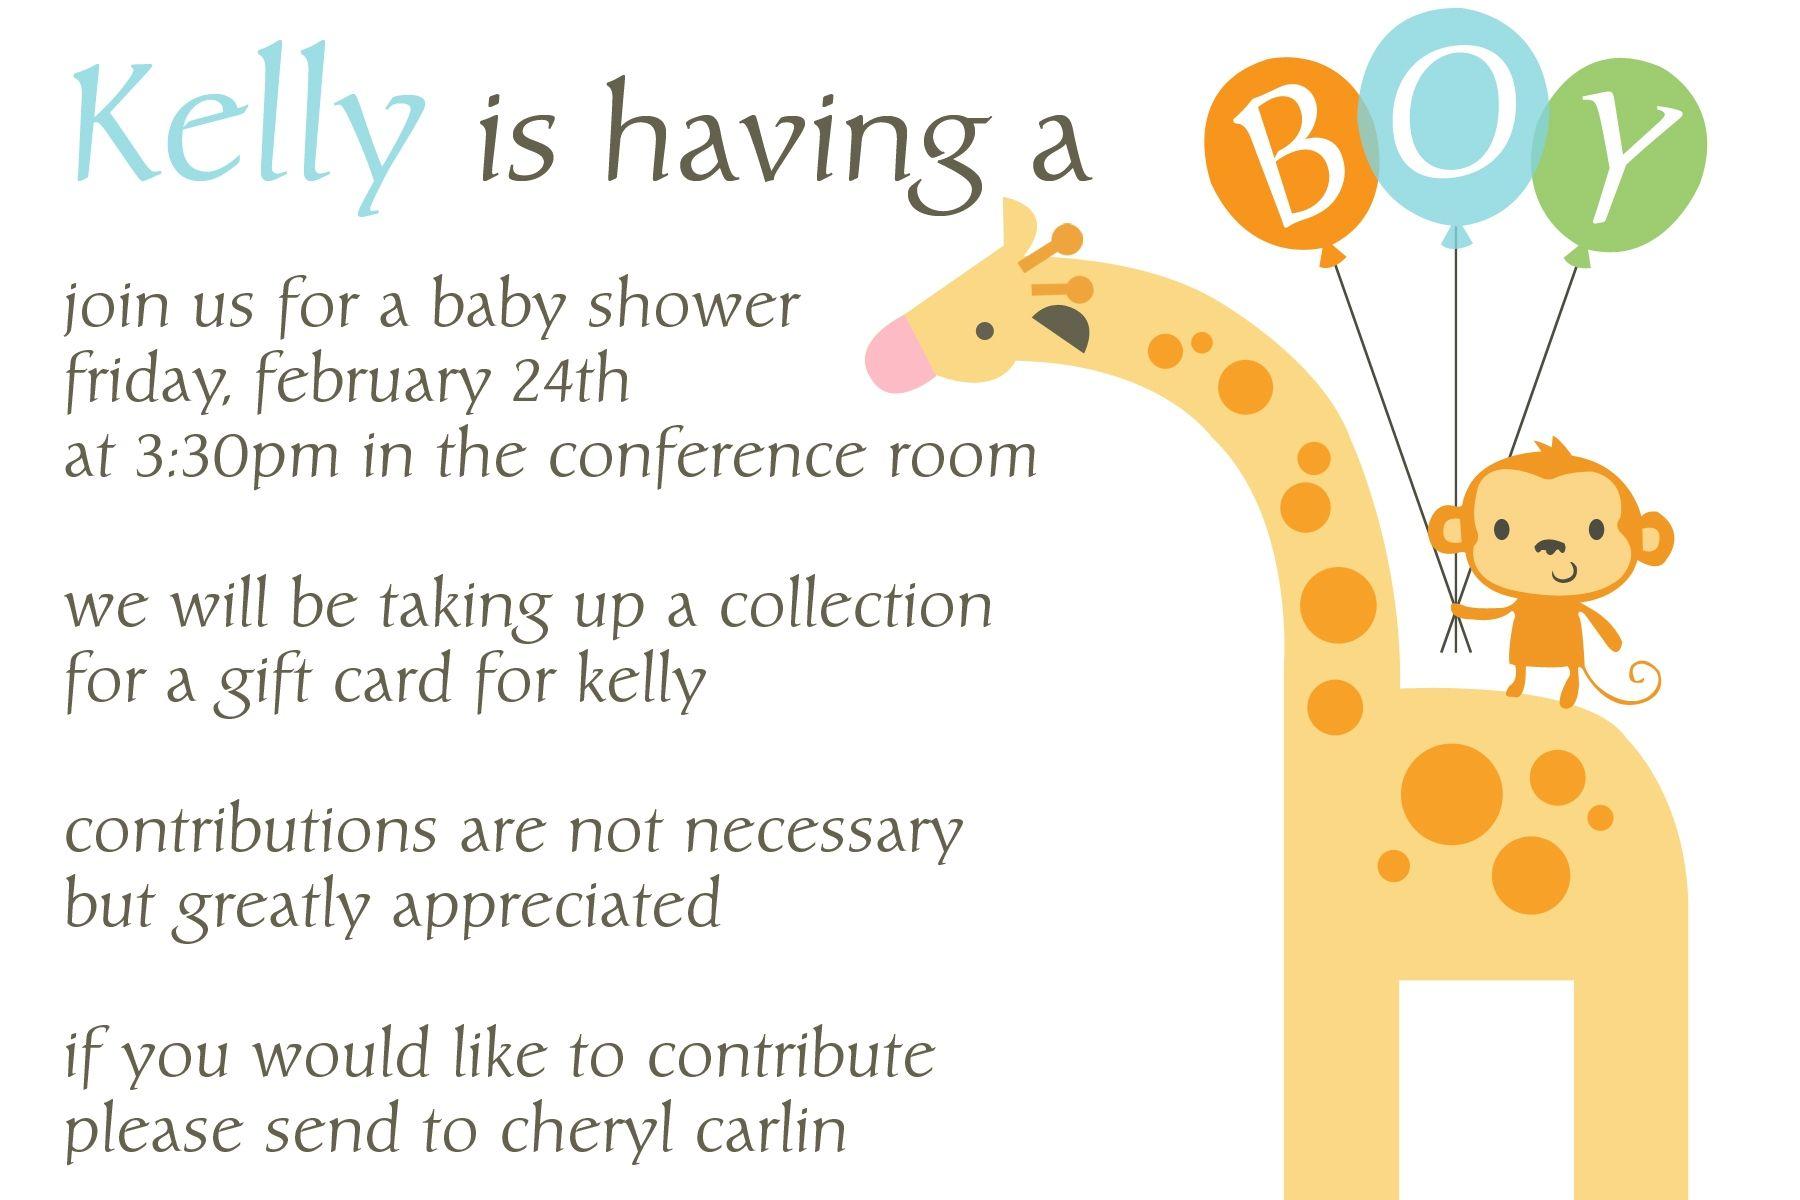 Office baby shower invitation wording samples httpatwebry office baby shower invitation wording samples stopboris Choice Image